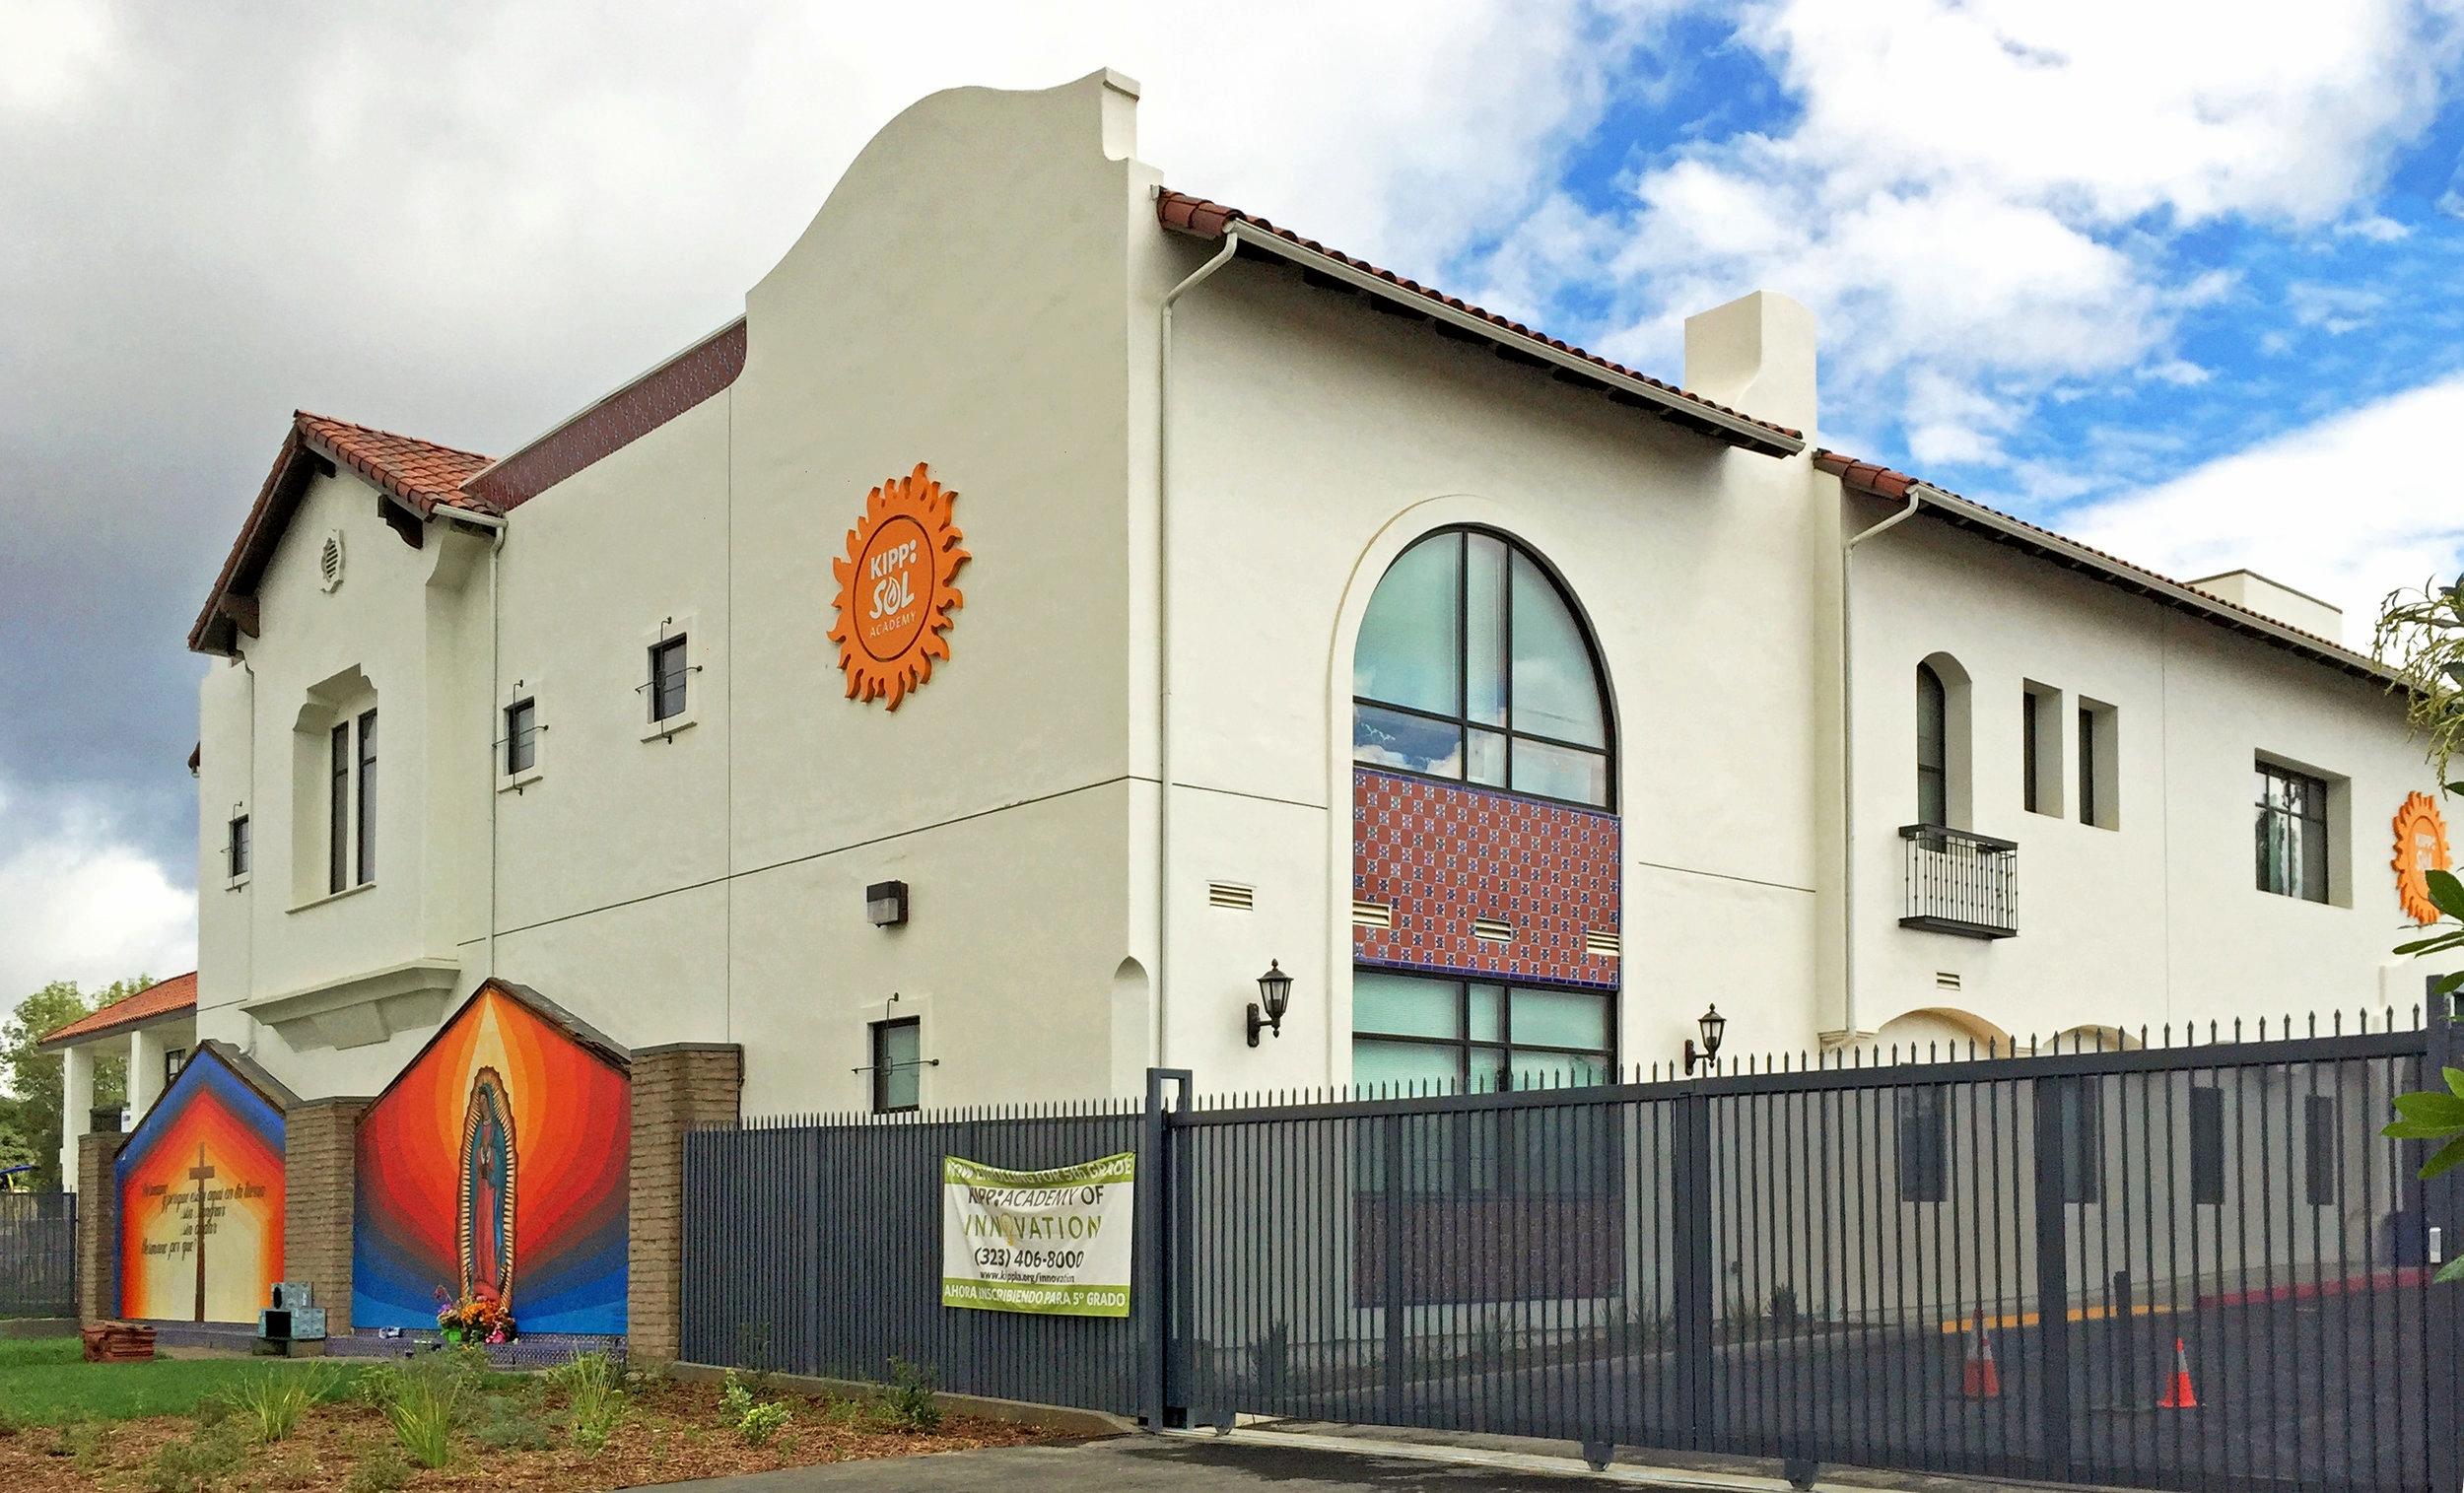 Kipp Iluminar & Sol Academy